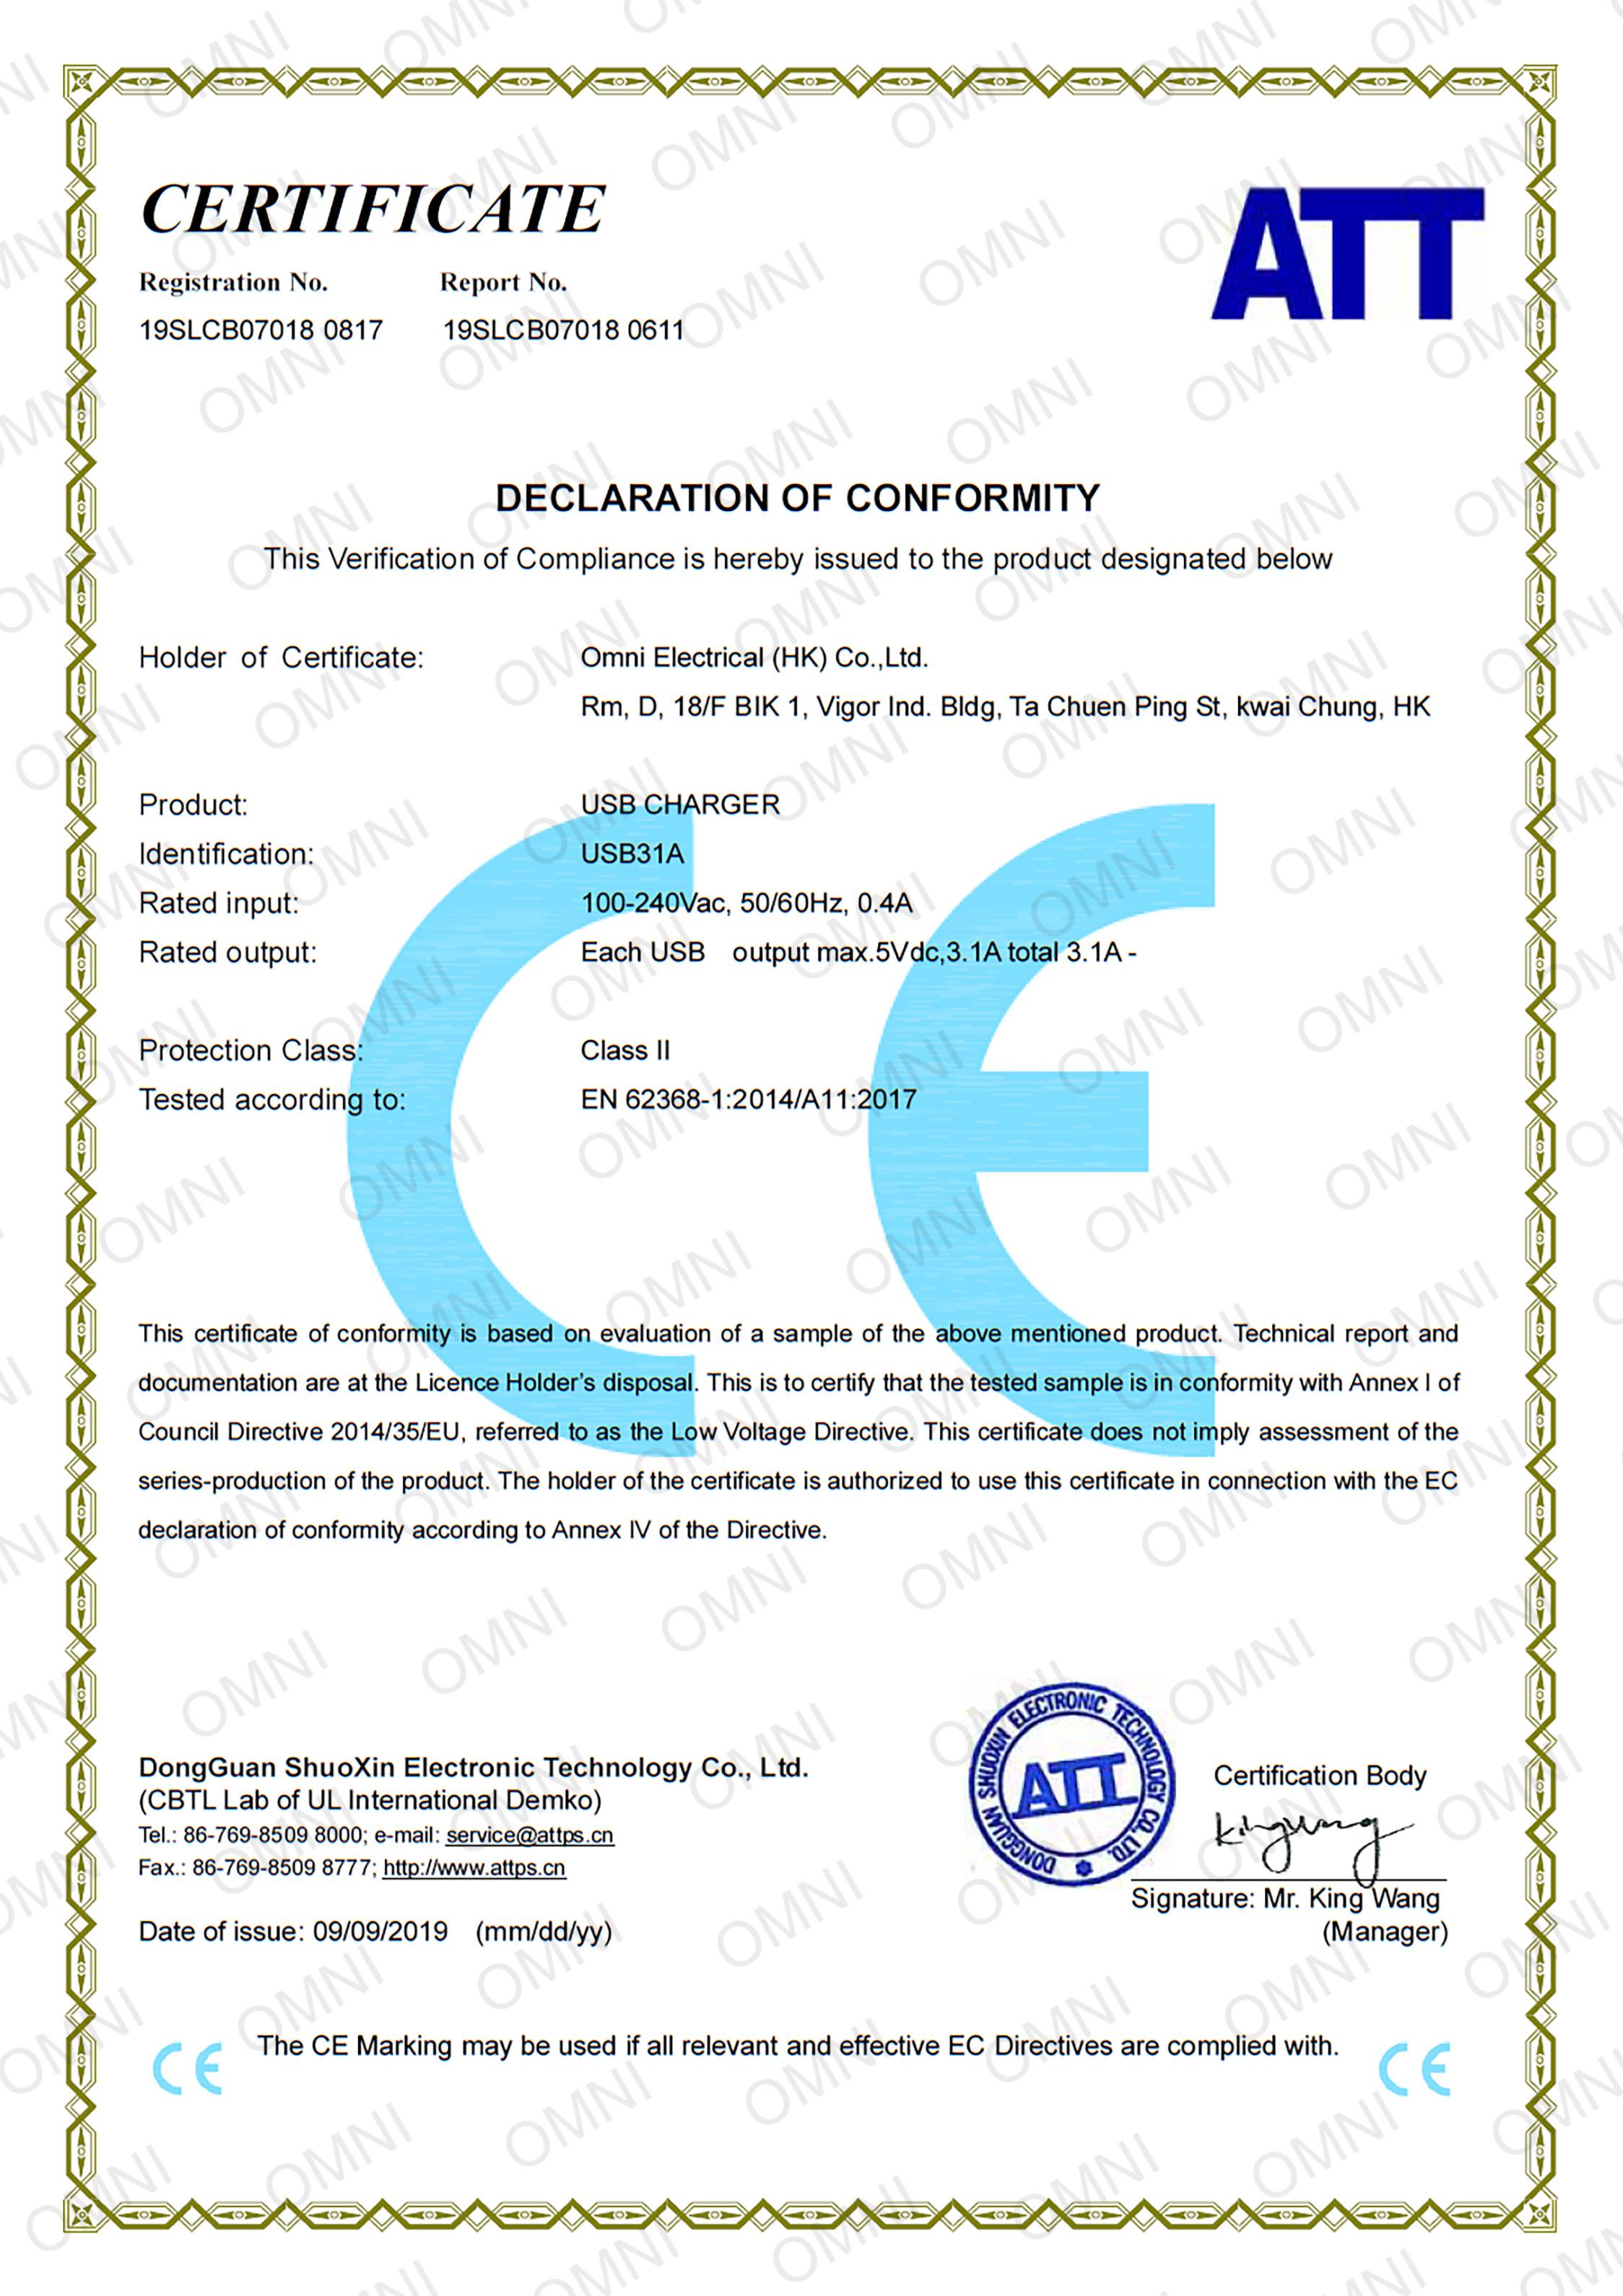 Safety Extension Socket, Testing Verification, 3.1A, EN 62368, 拖板, USB, EN62368, 證書, 安全, 標準, 安全標準